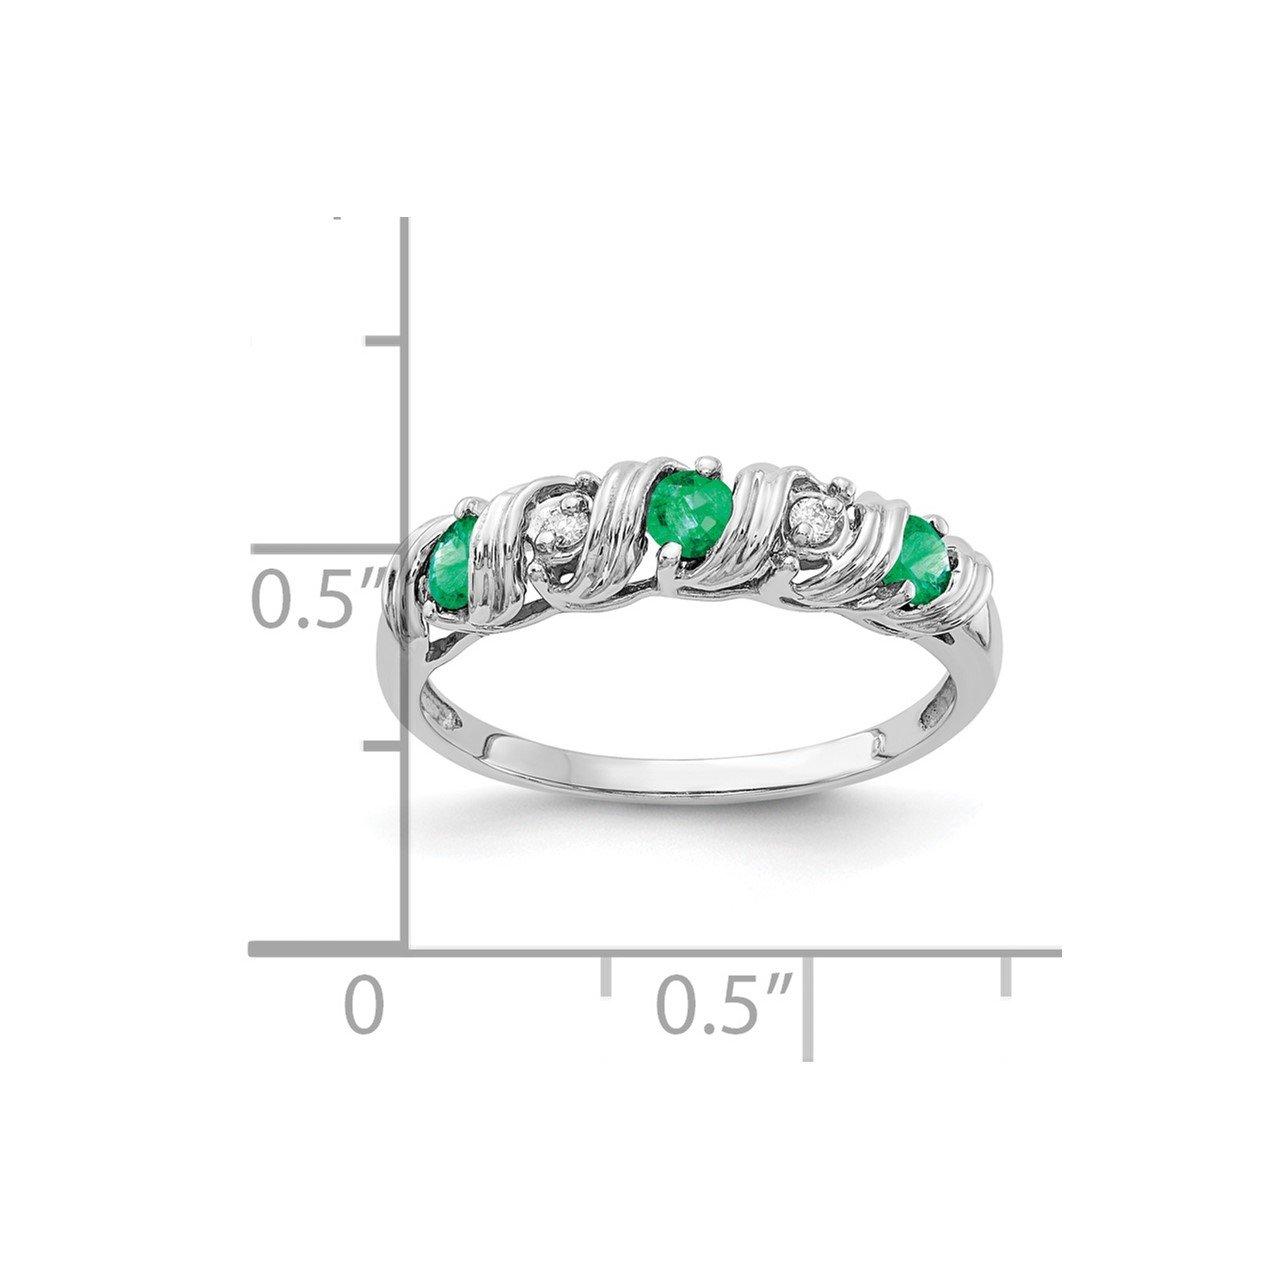 14k White Gold 2.75mm Emerald AA Diamond ring-1